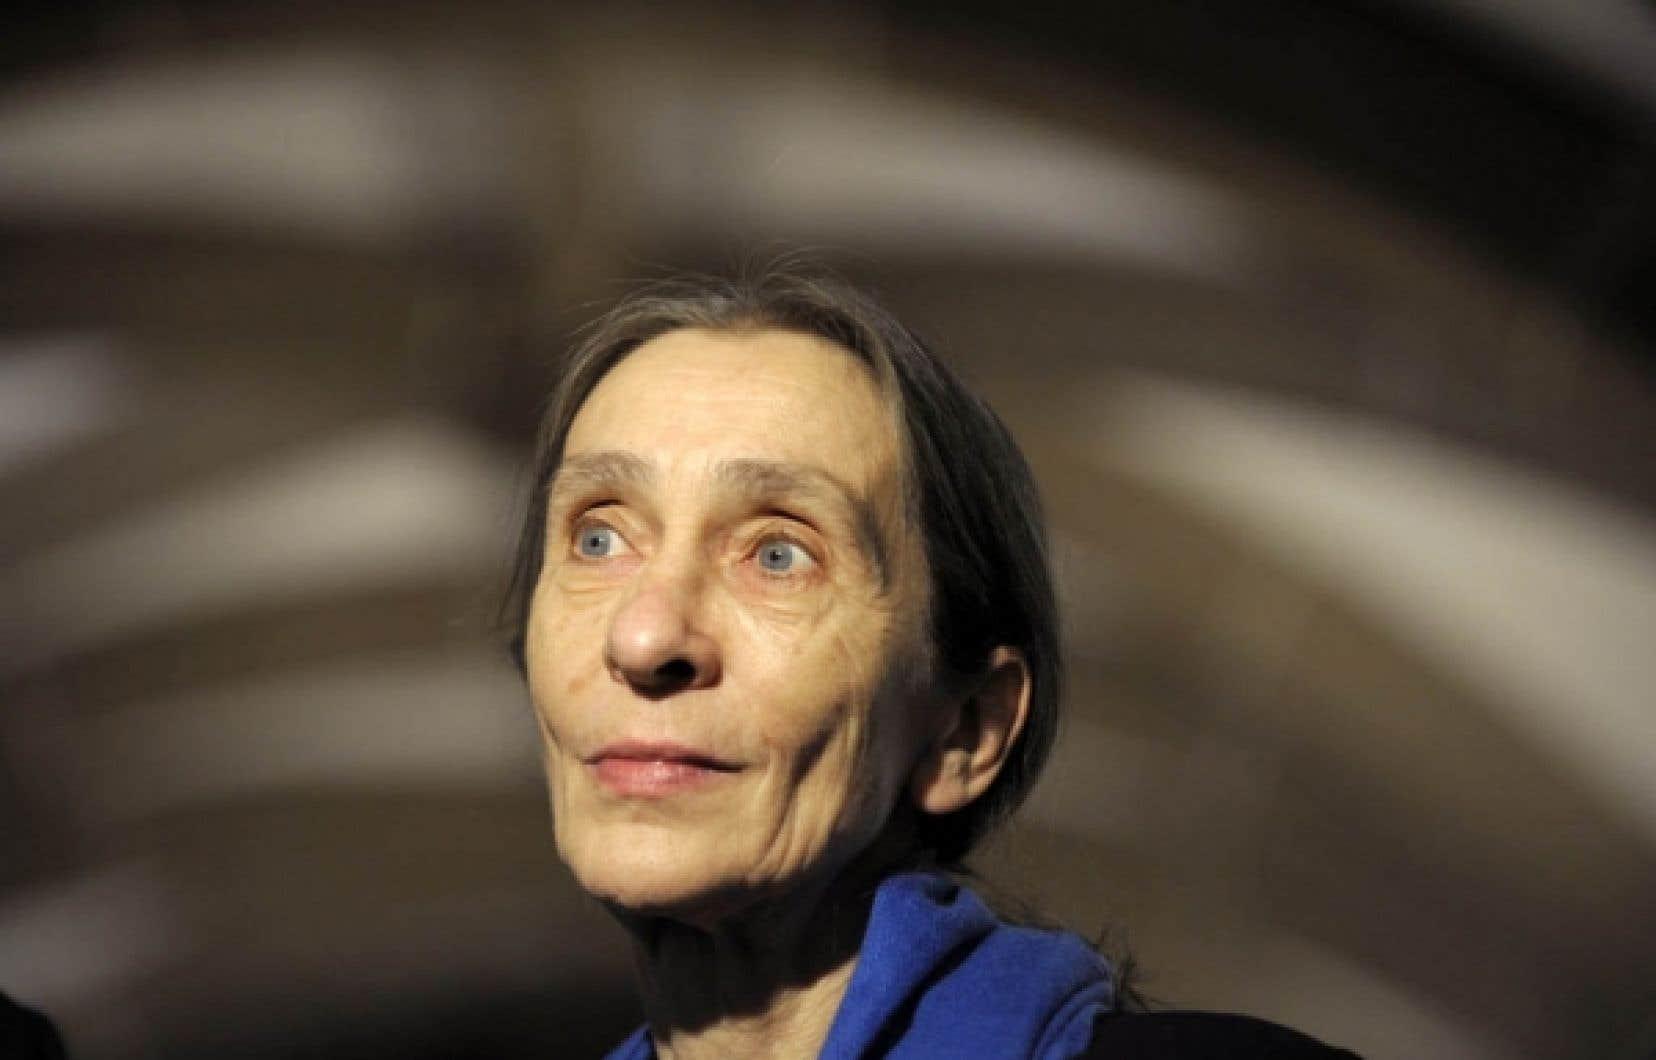 La chorégraphe Pina Bausch en octobre 2008, quelques mois avant sa mort.